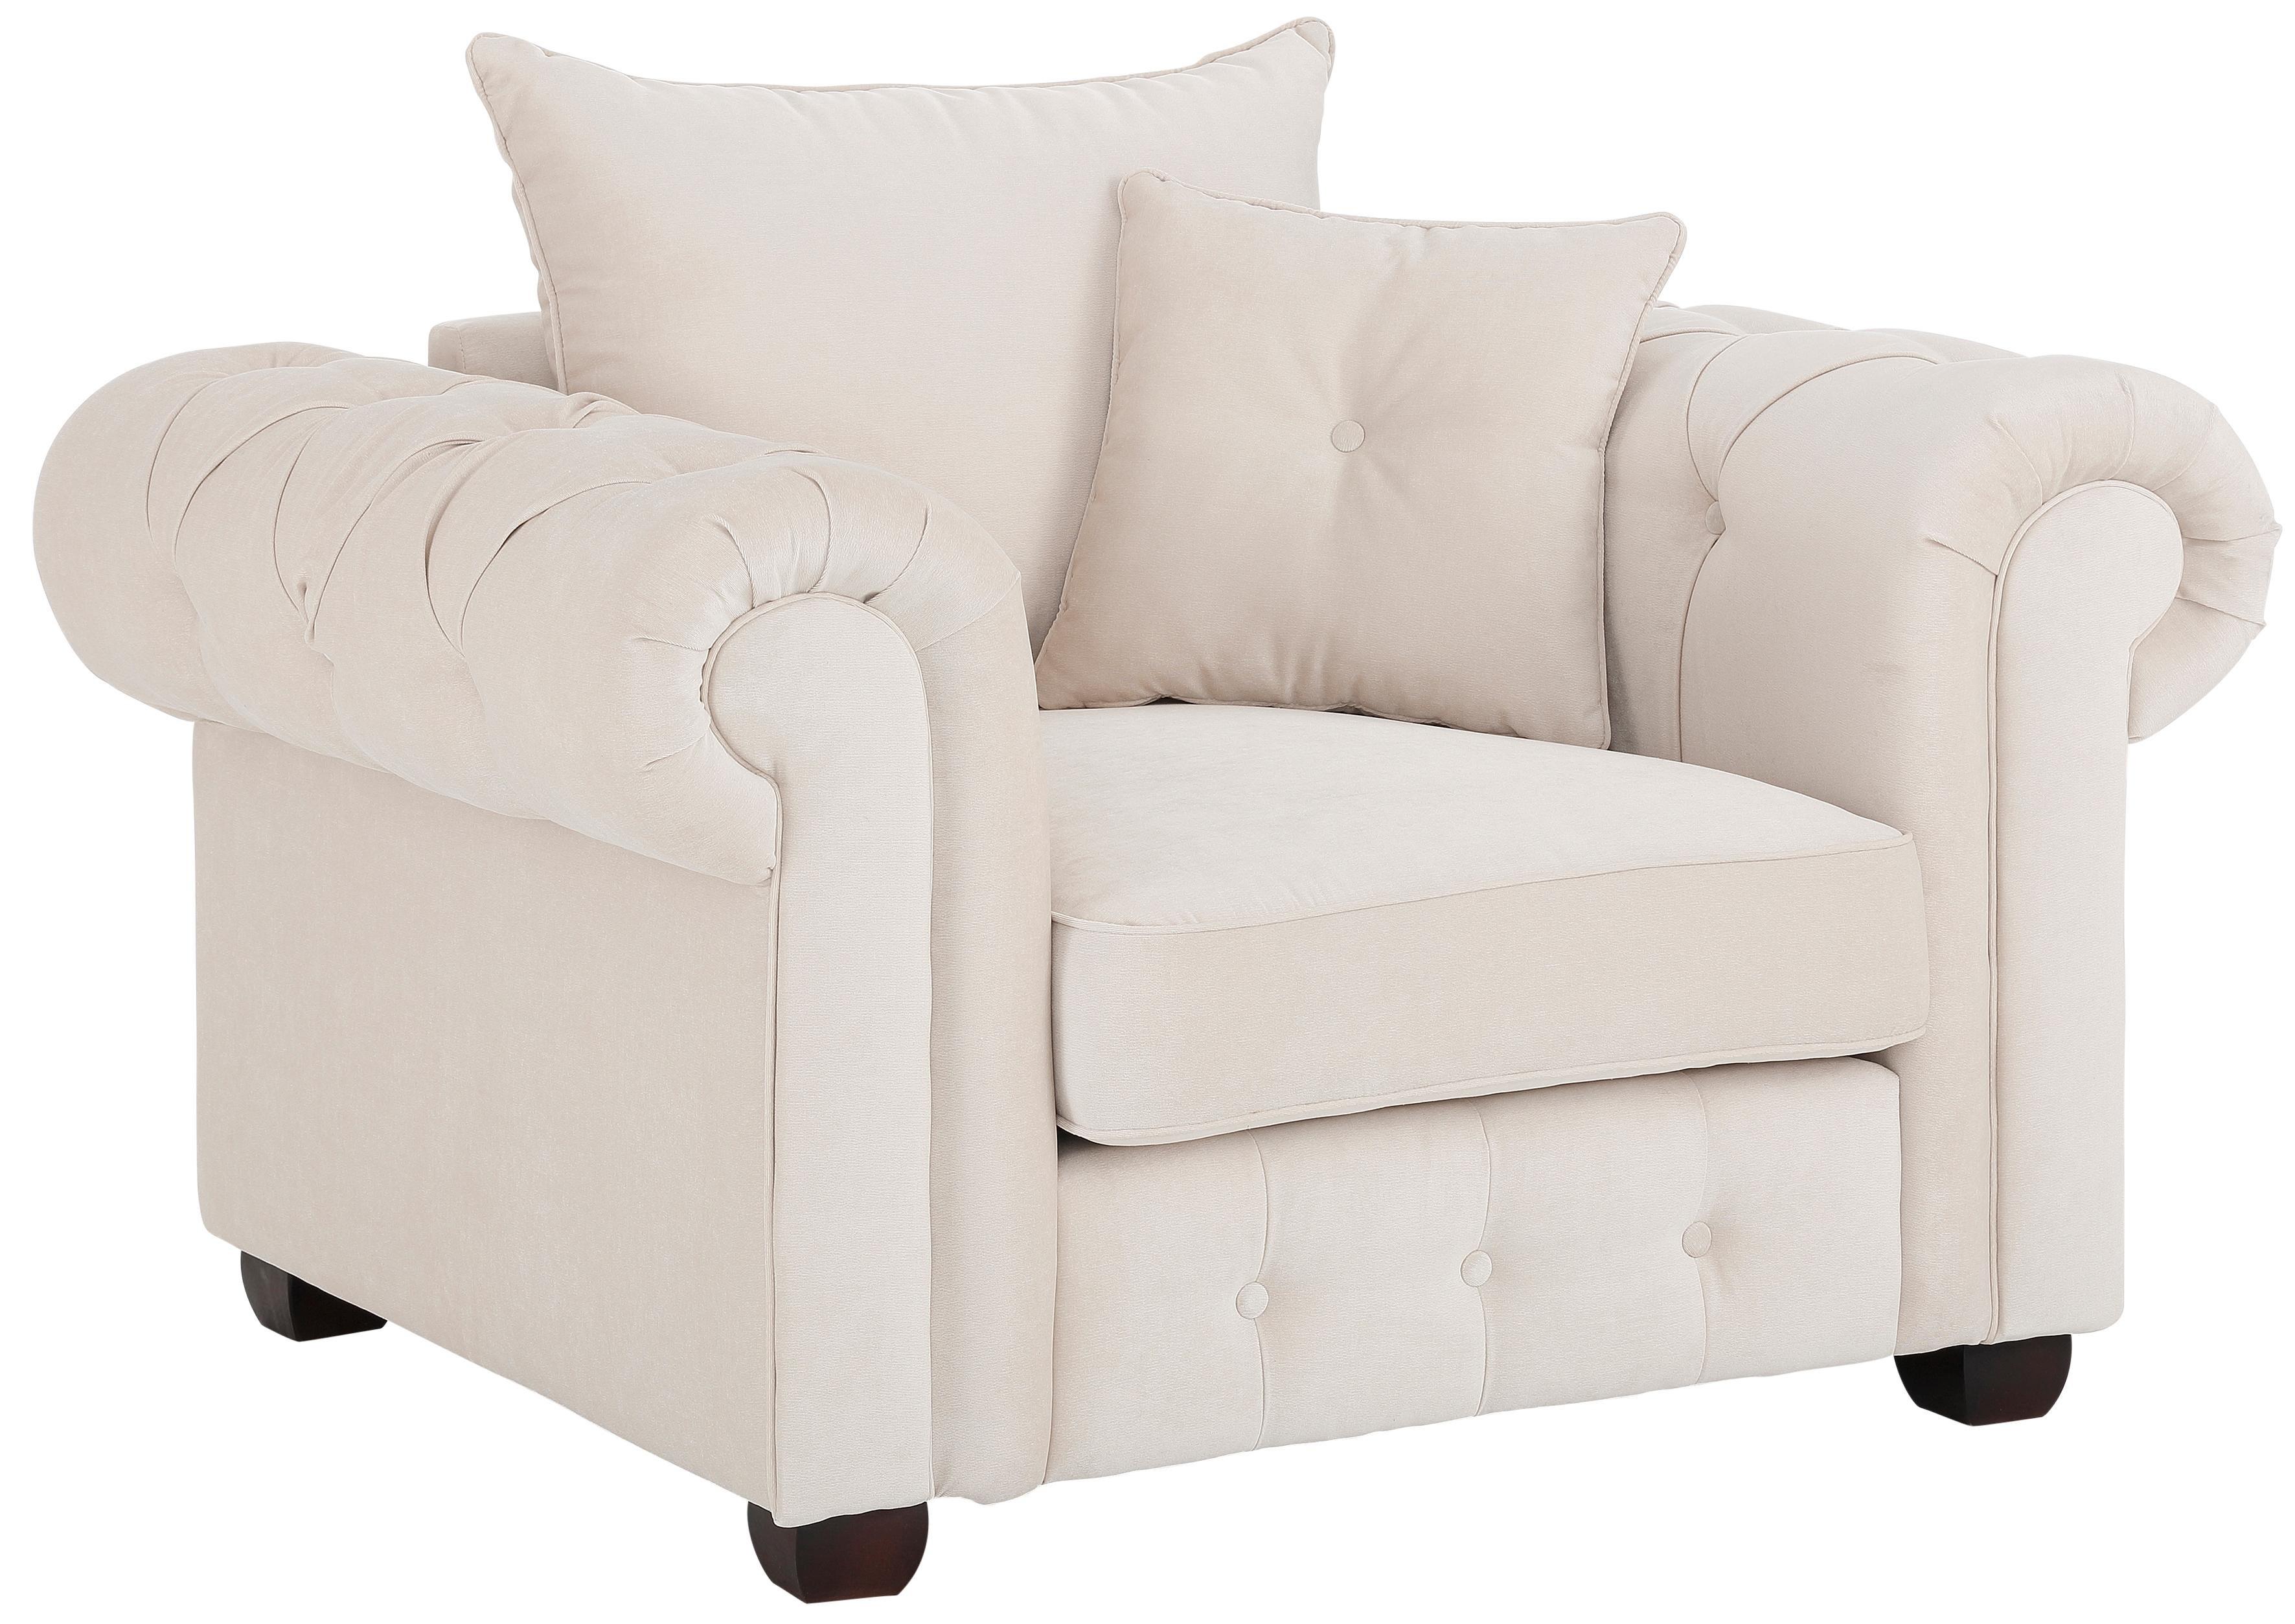 home affaire fauteuil san pedro vind je bij otto. Black Bedroom Furniture Sets. Home Design Ideas